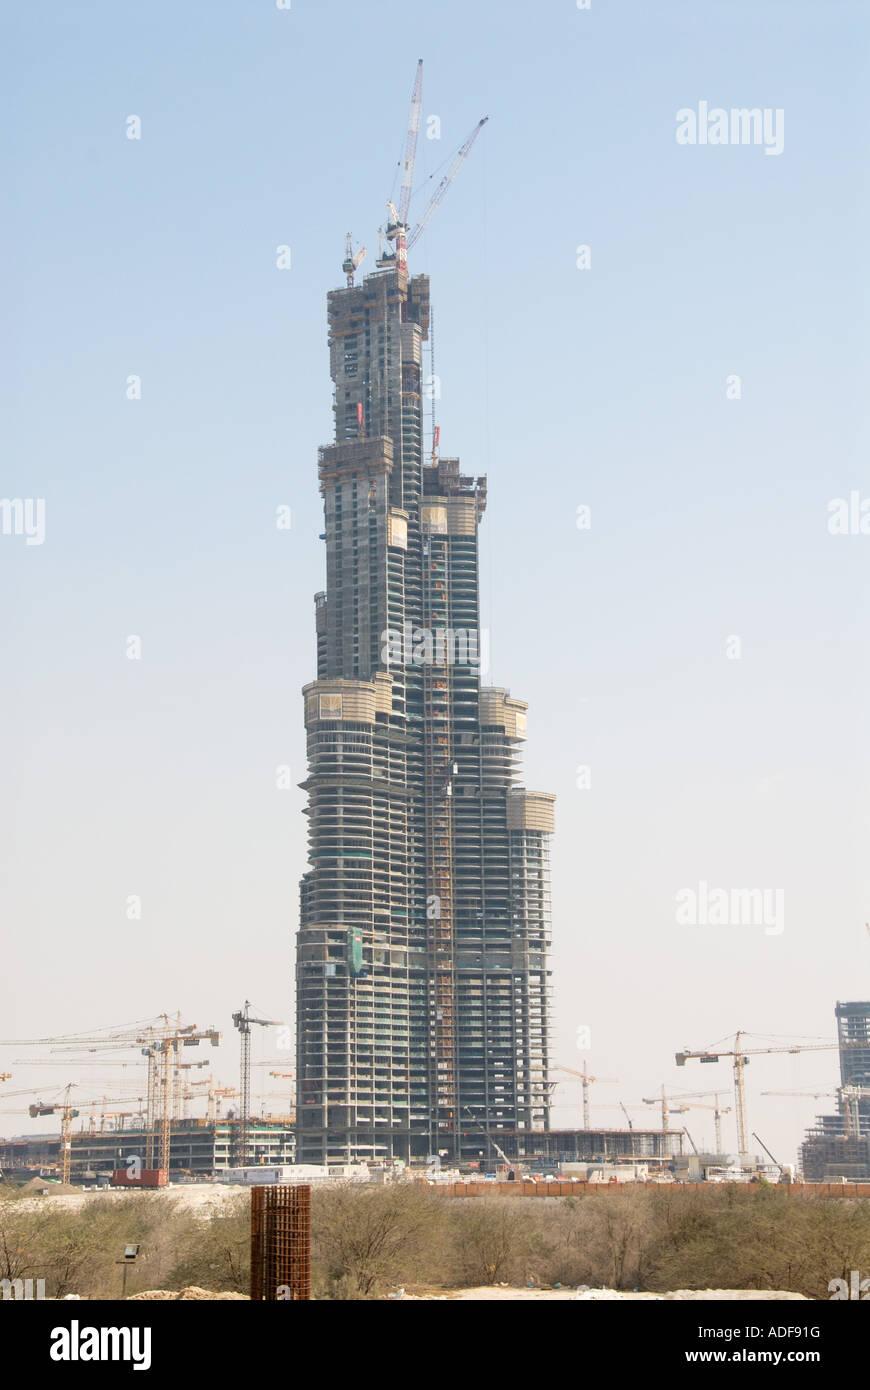 World S Tallest Building Under Construction Stock Photo Alamy